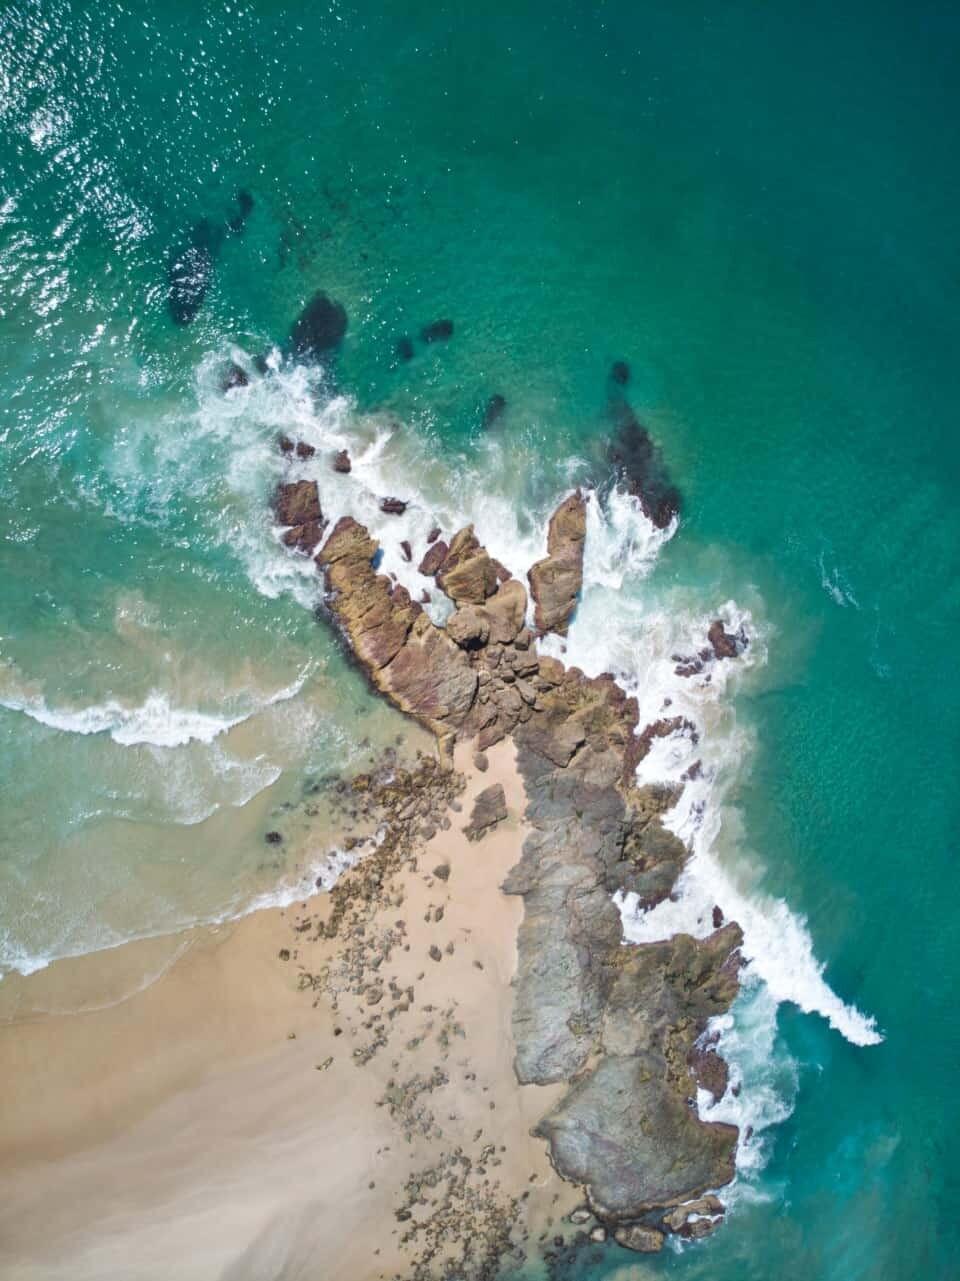 Miners Beach in Port Macquarie, New South Wales, Australia